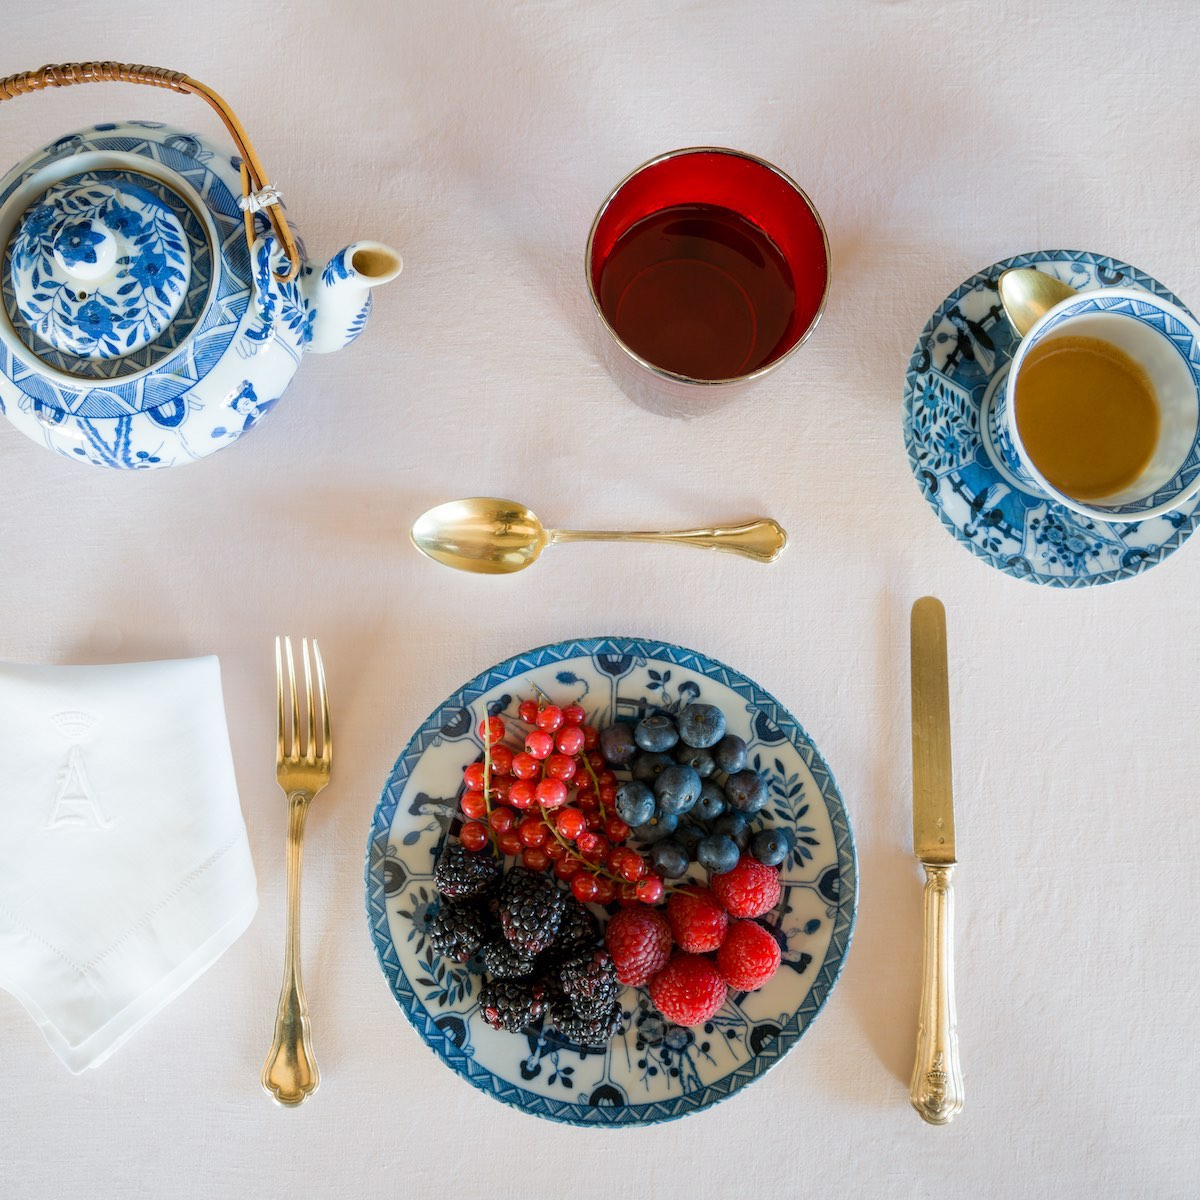 vaso-red-table-glass-dining-fine-murano-artisanal